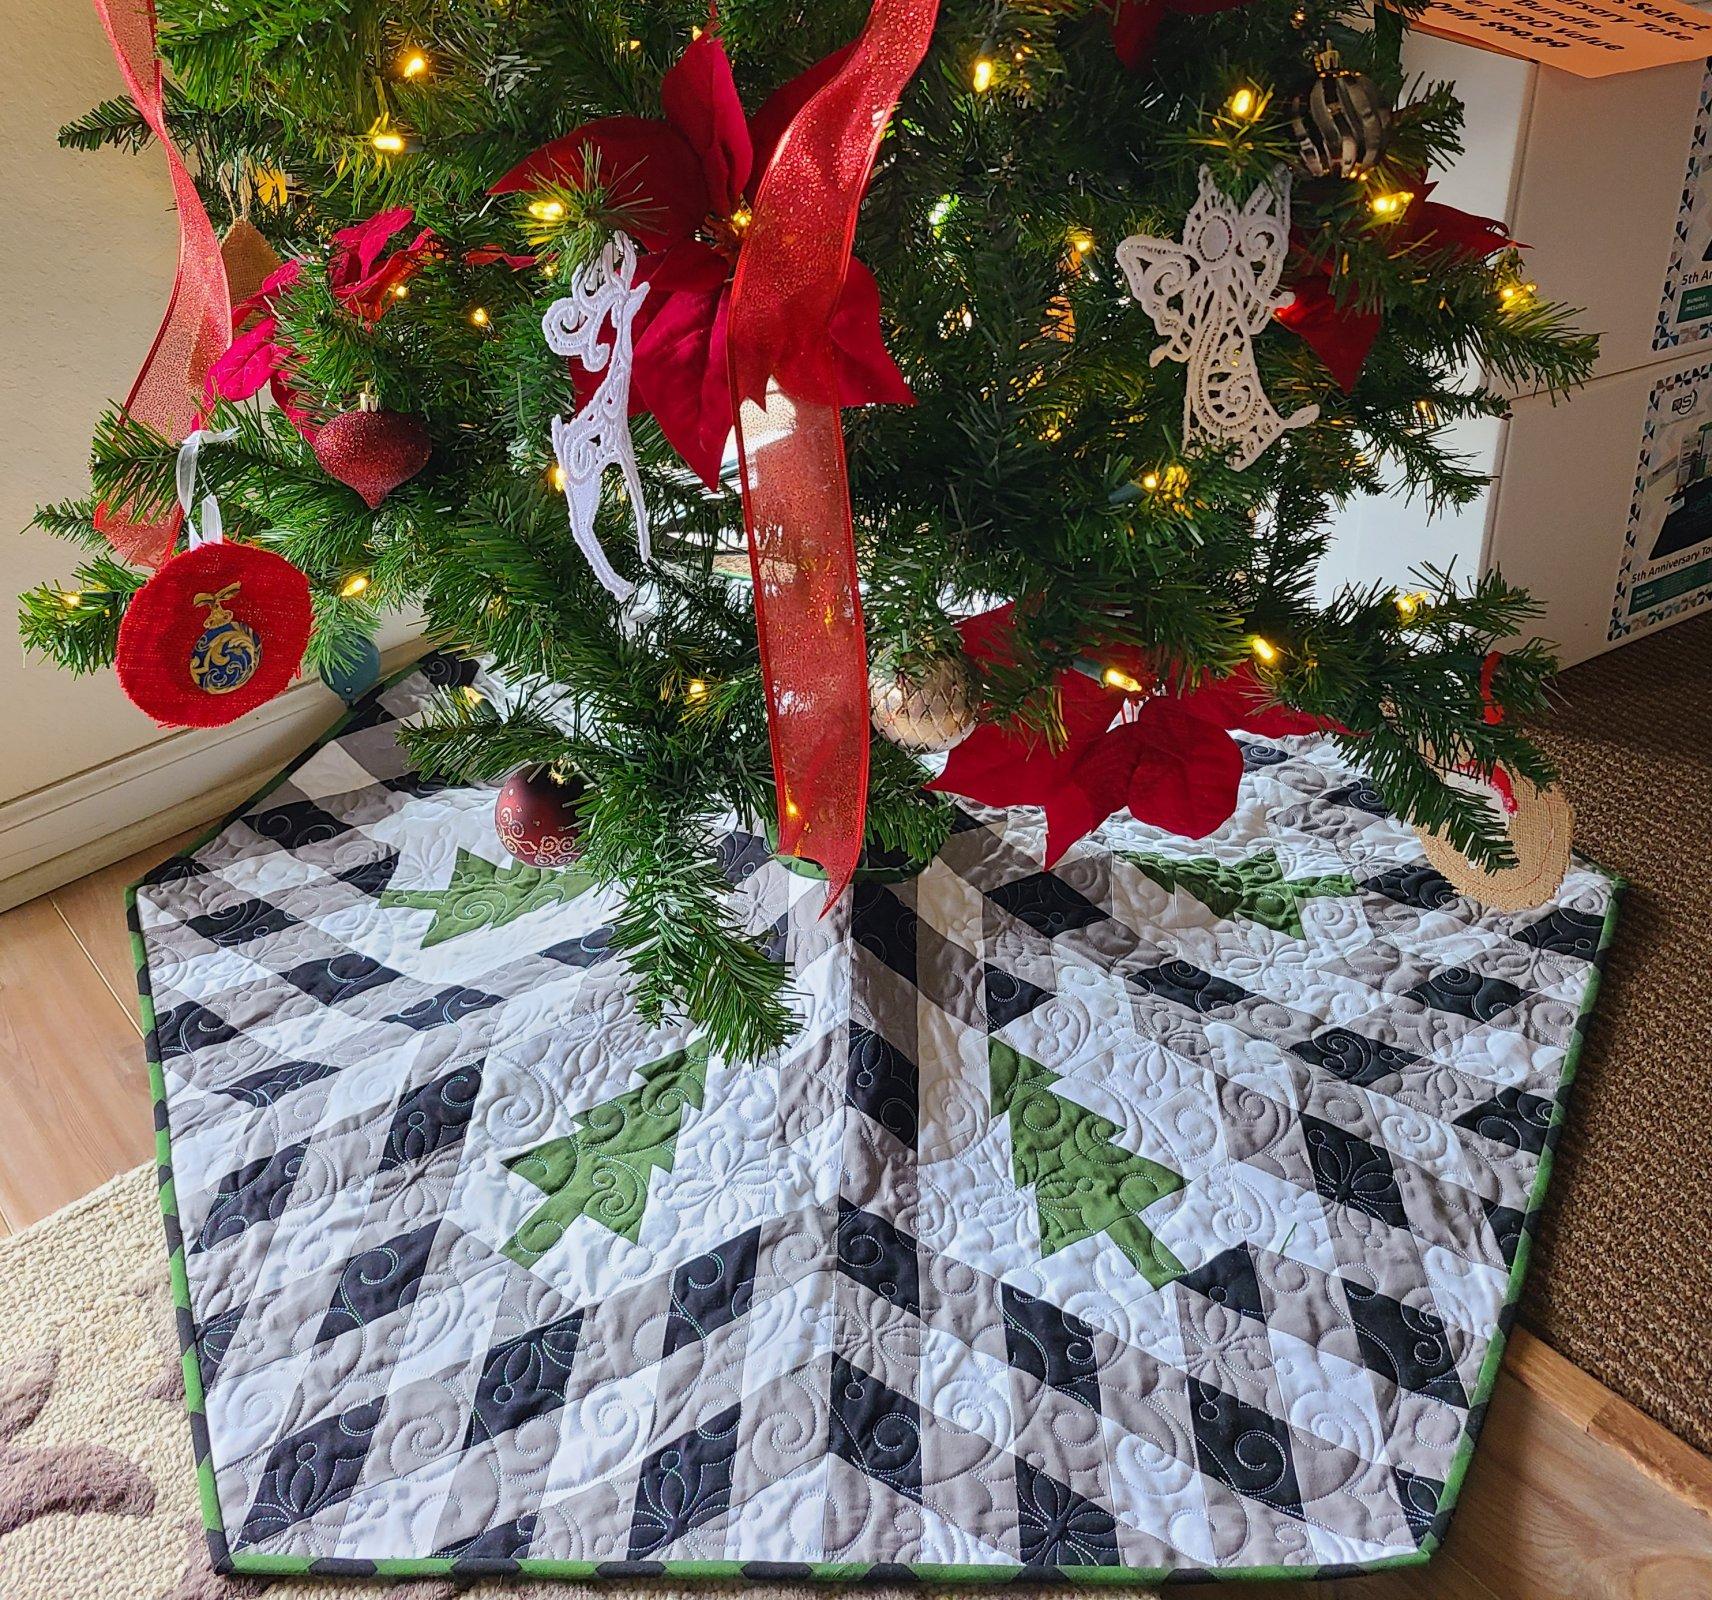 Buffalo Lodge Tree Skirt Kit 41 x 48